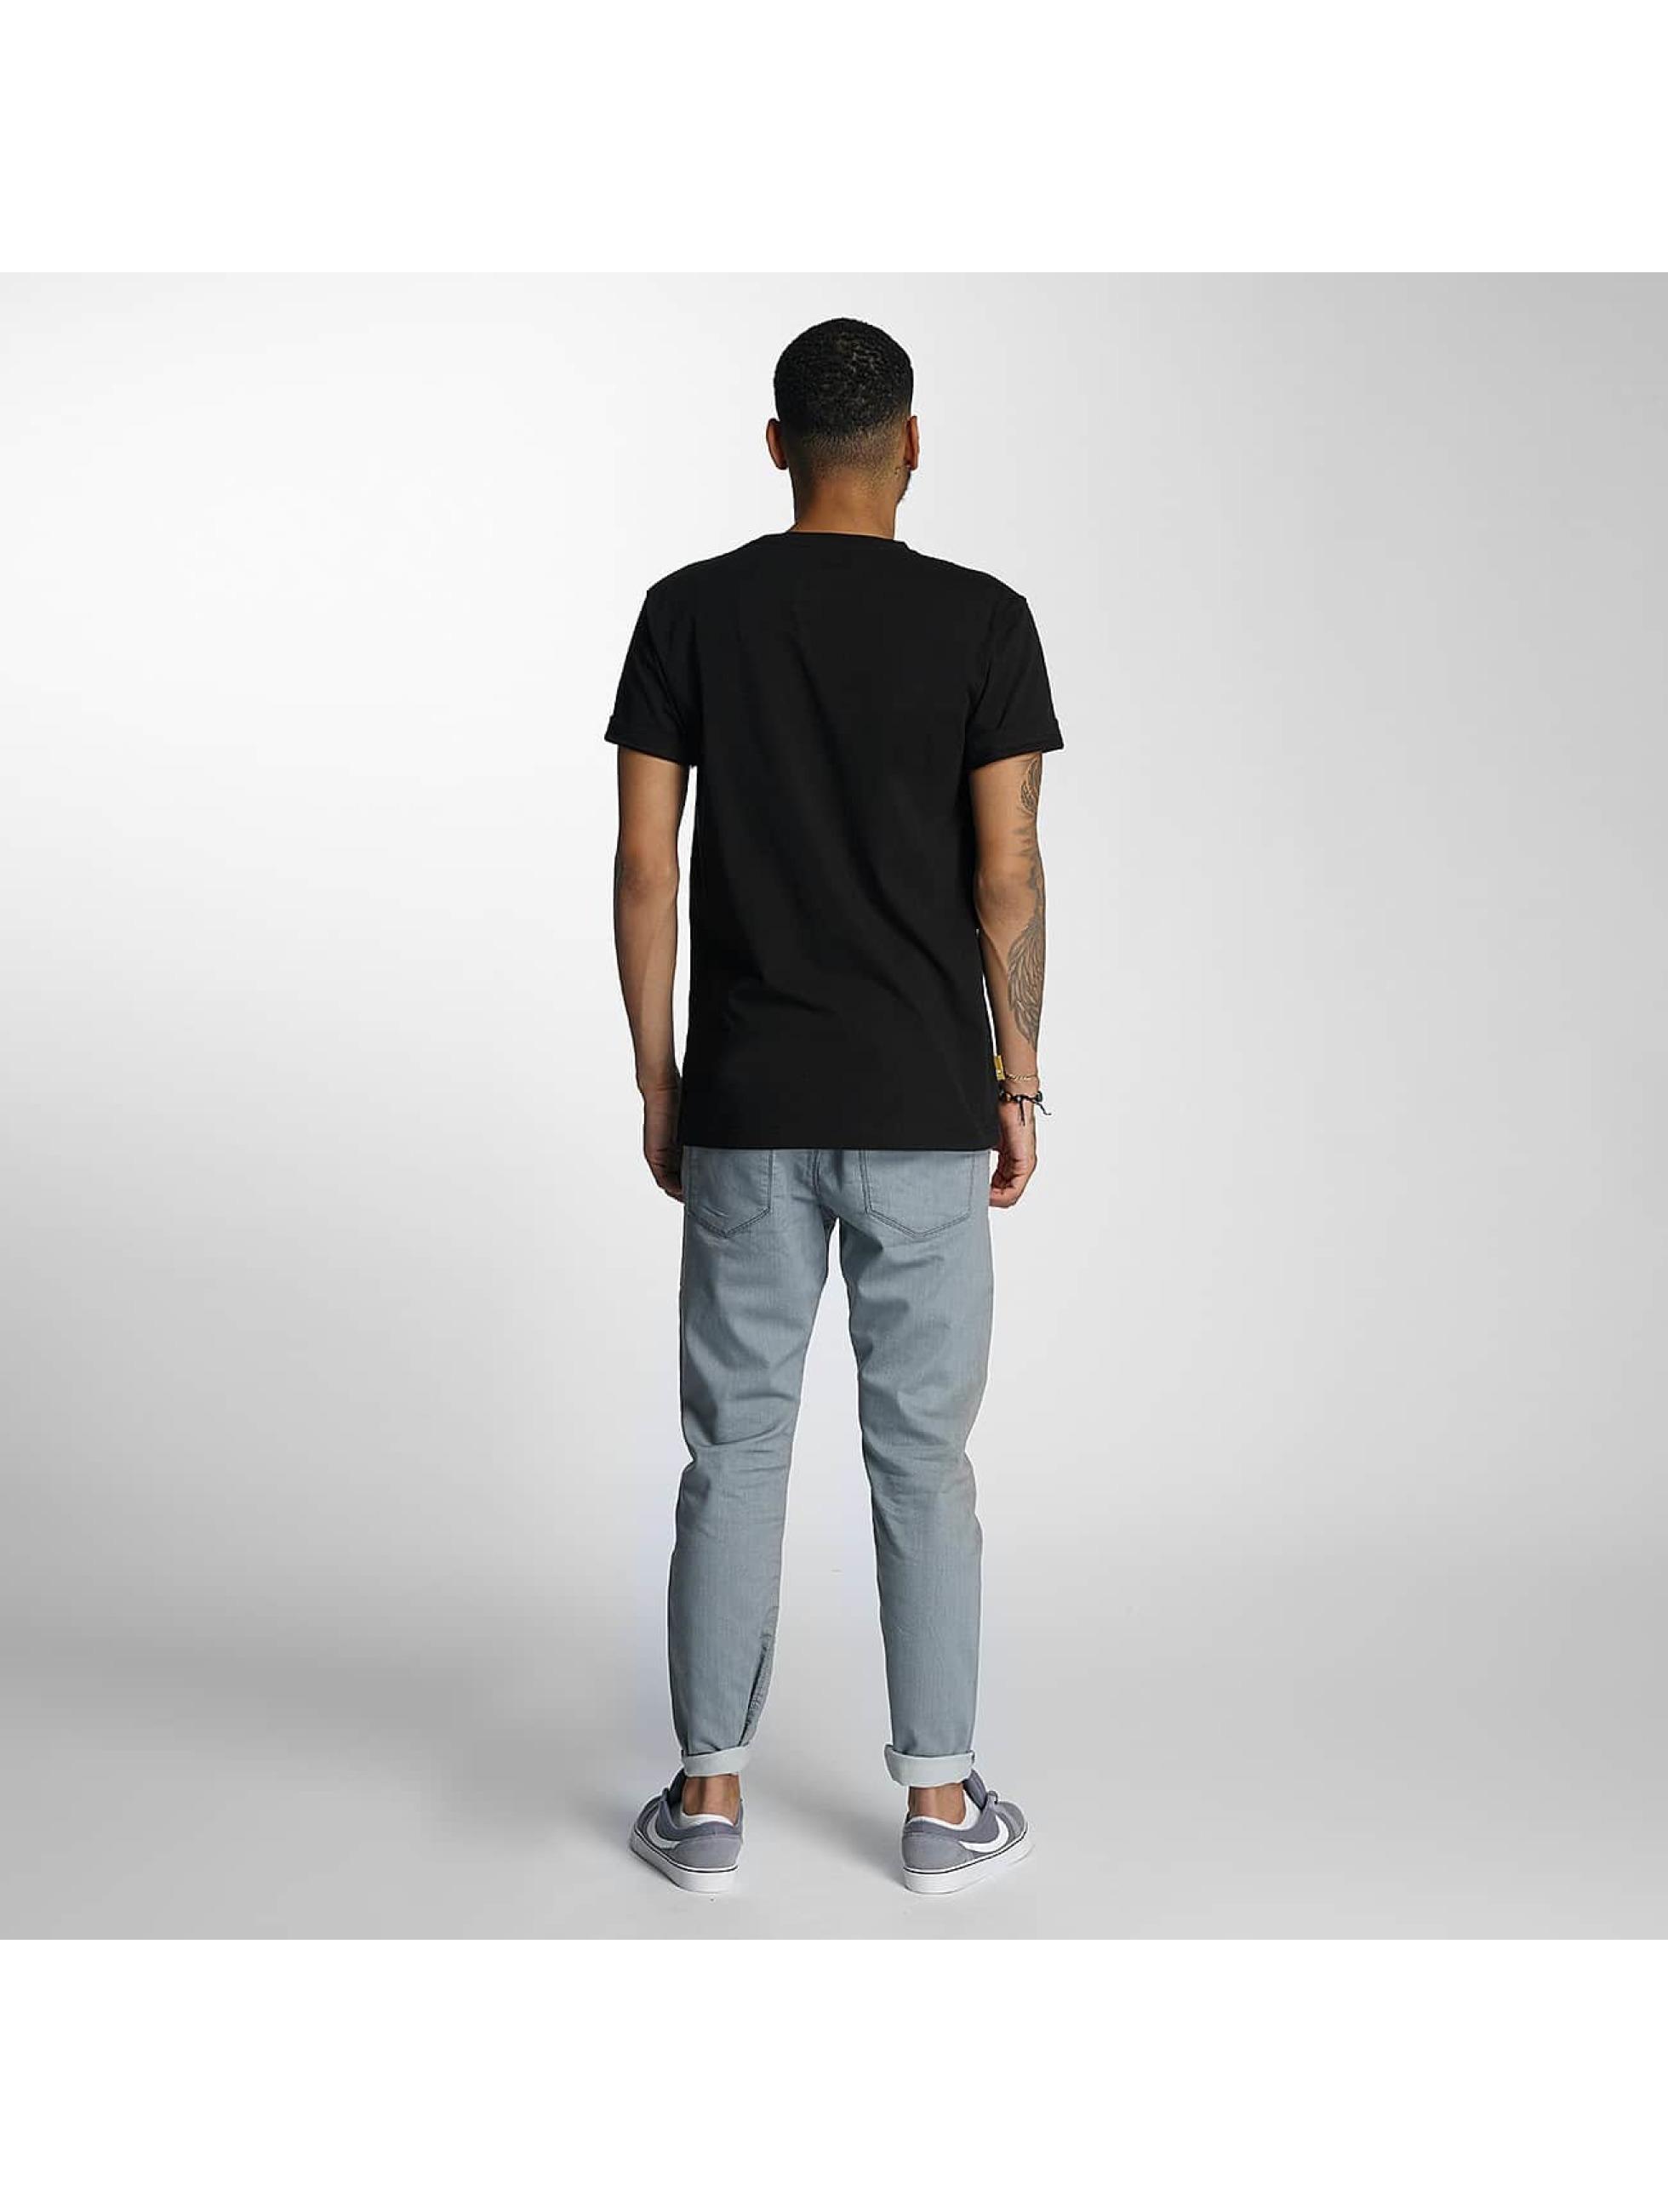 CHABOS IIVII T-Shirt Omerta black